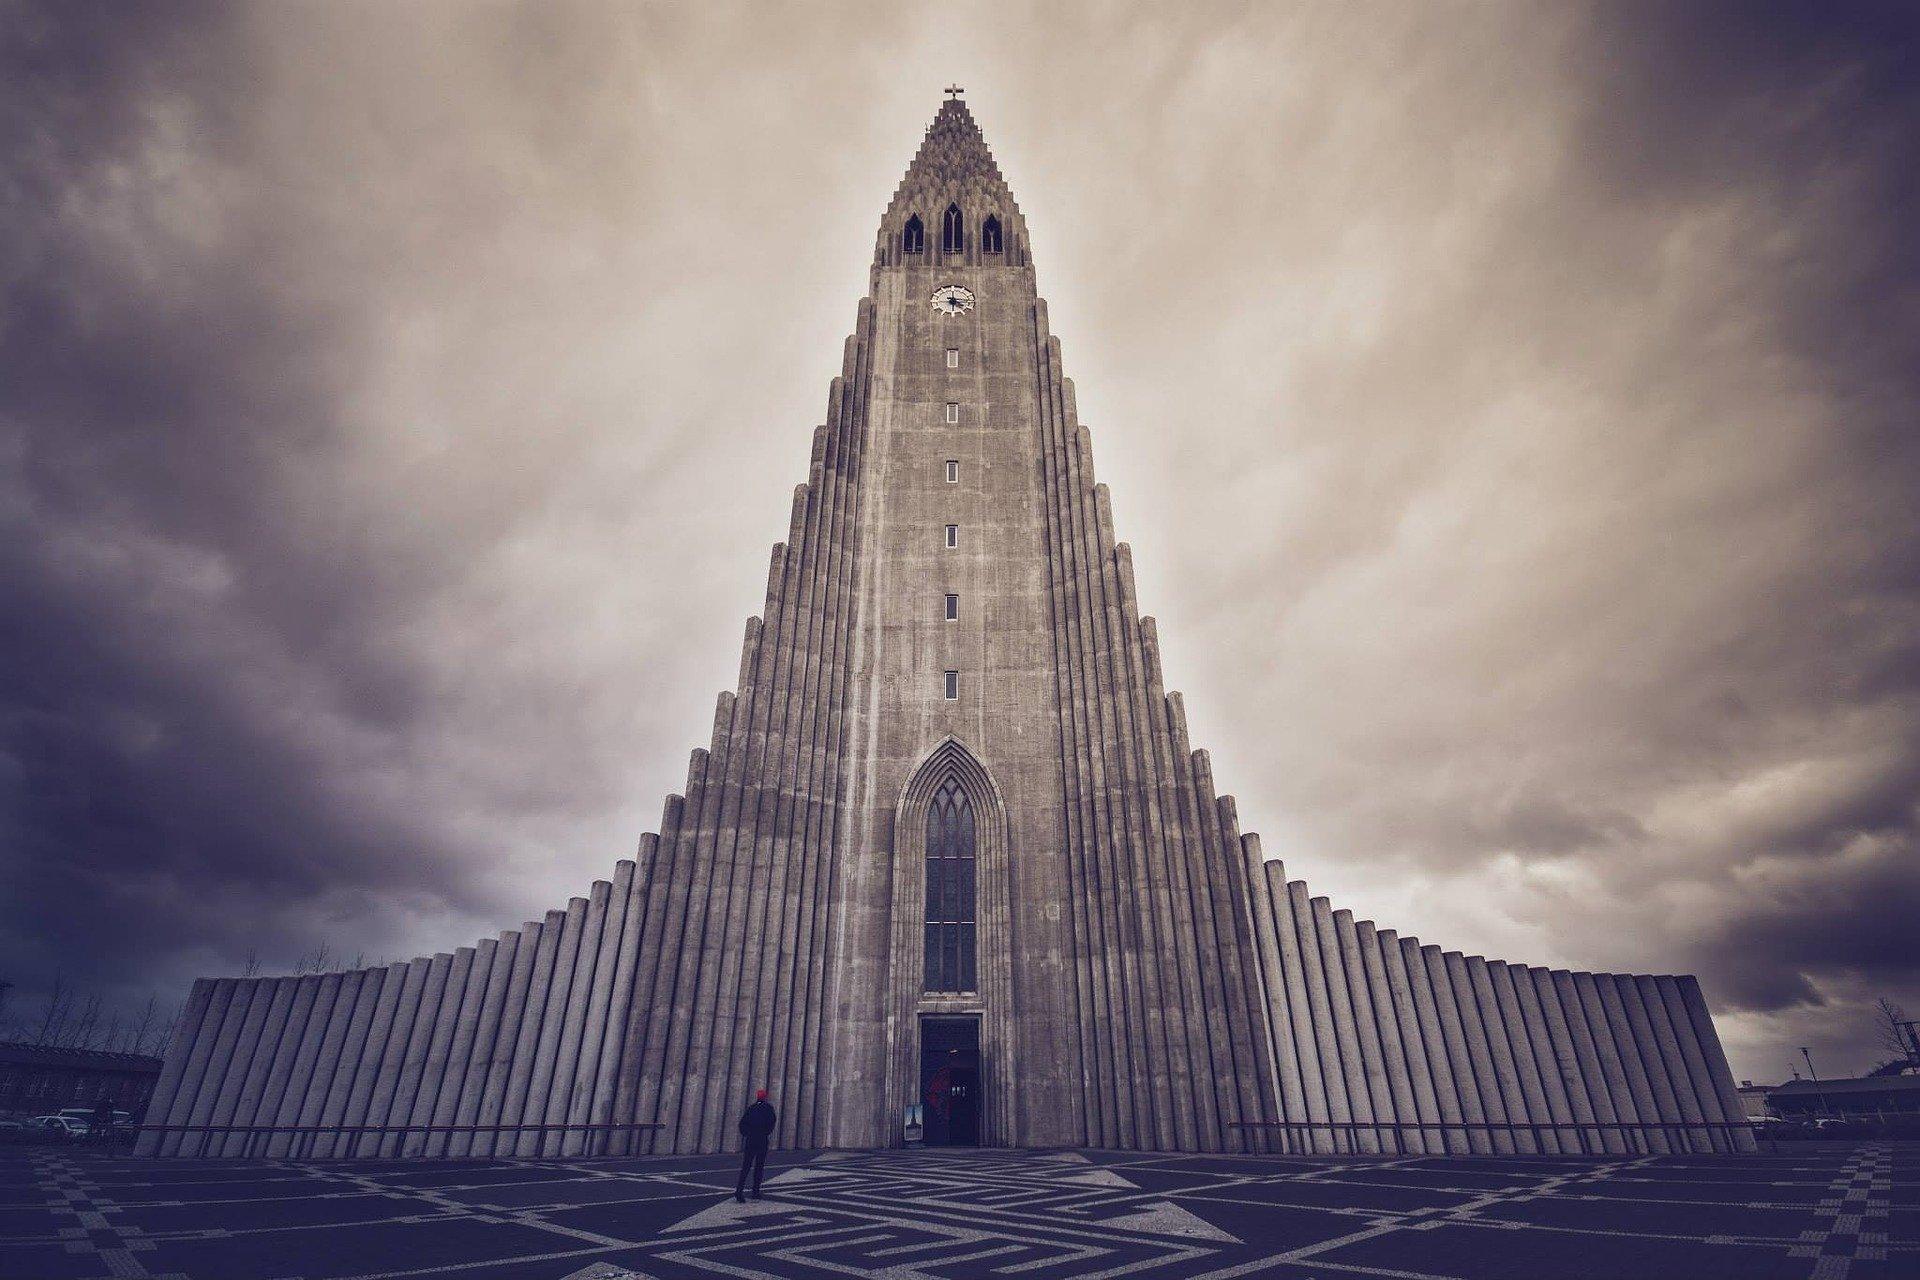 Hallgrimskirkja, Reykjavik, church, Iceland